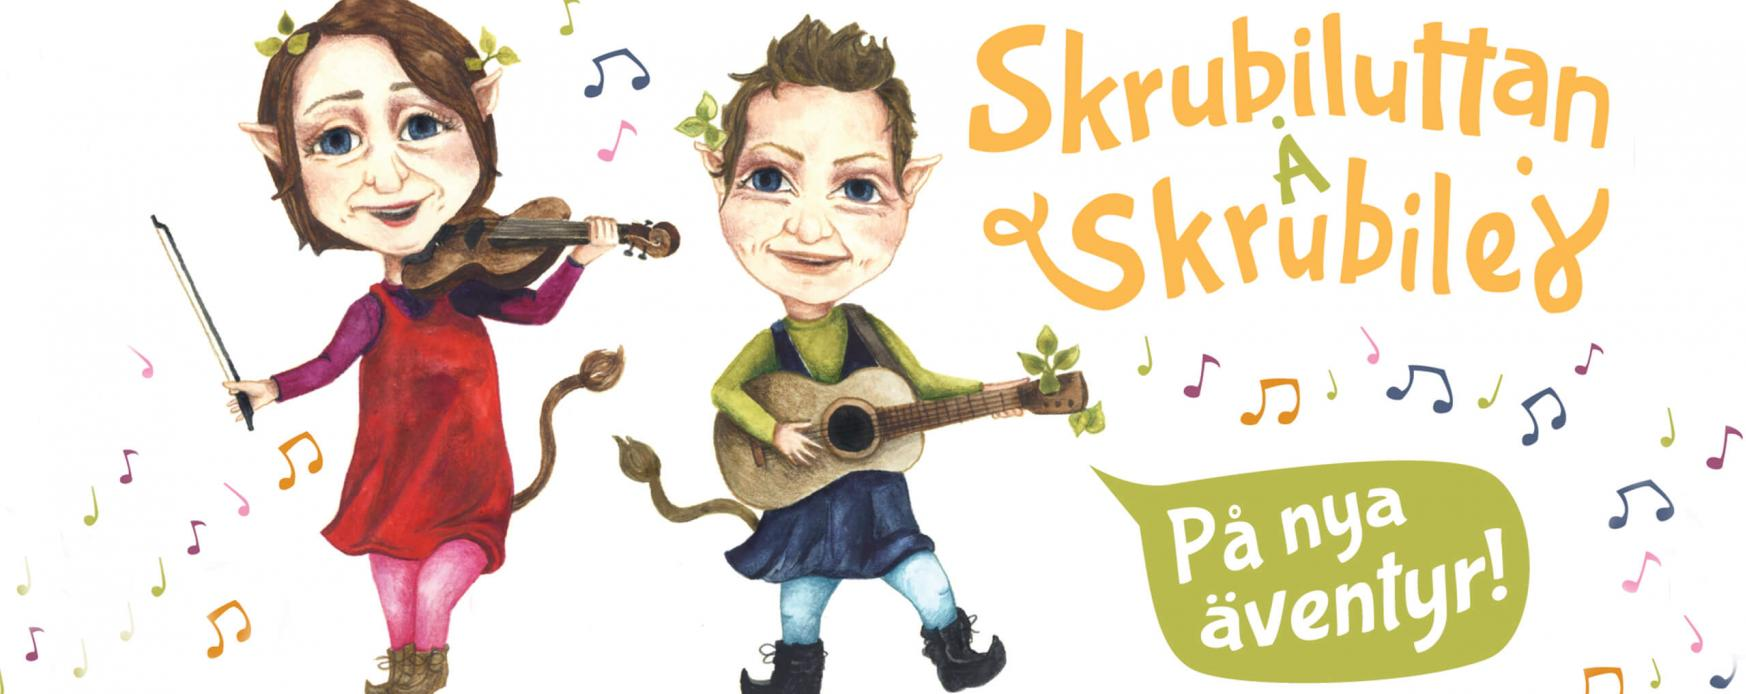 Nordens institut på Åland presenterar folkmusik får både gammal som ung Skrubiluttan Å Skrubilej .